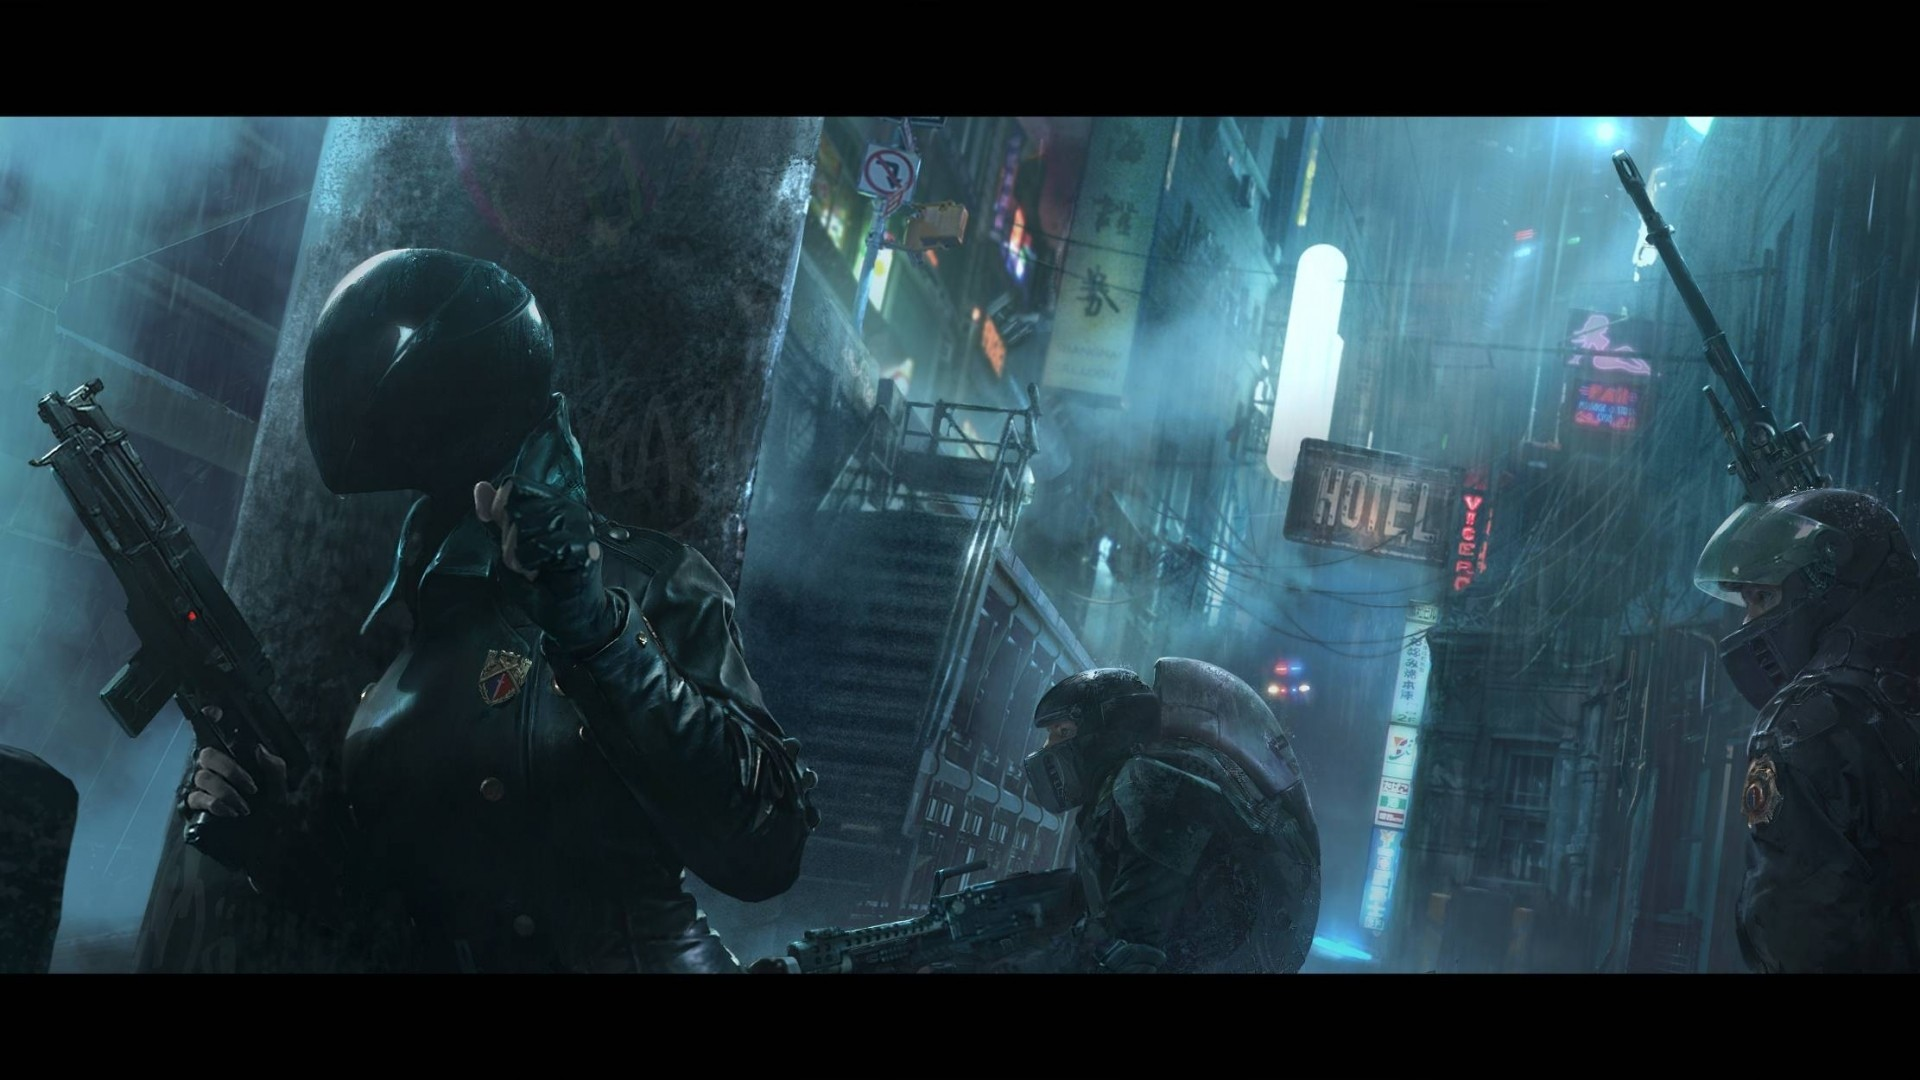 Cyberpunk city wallpaper 15345 1920x1080